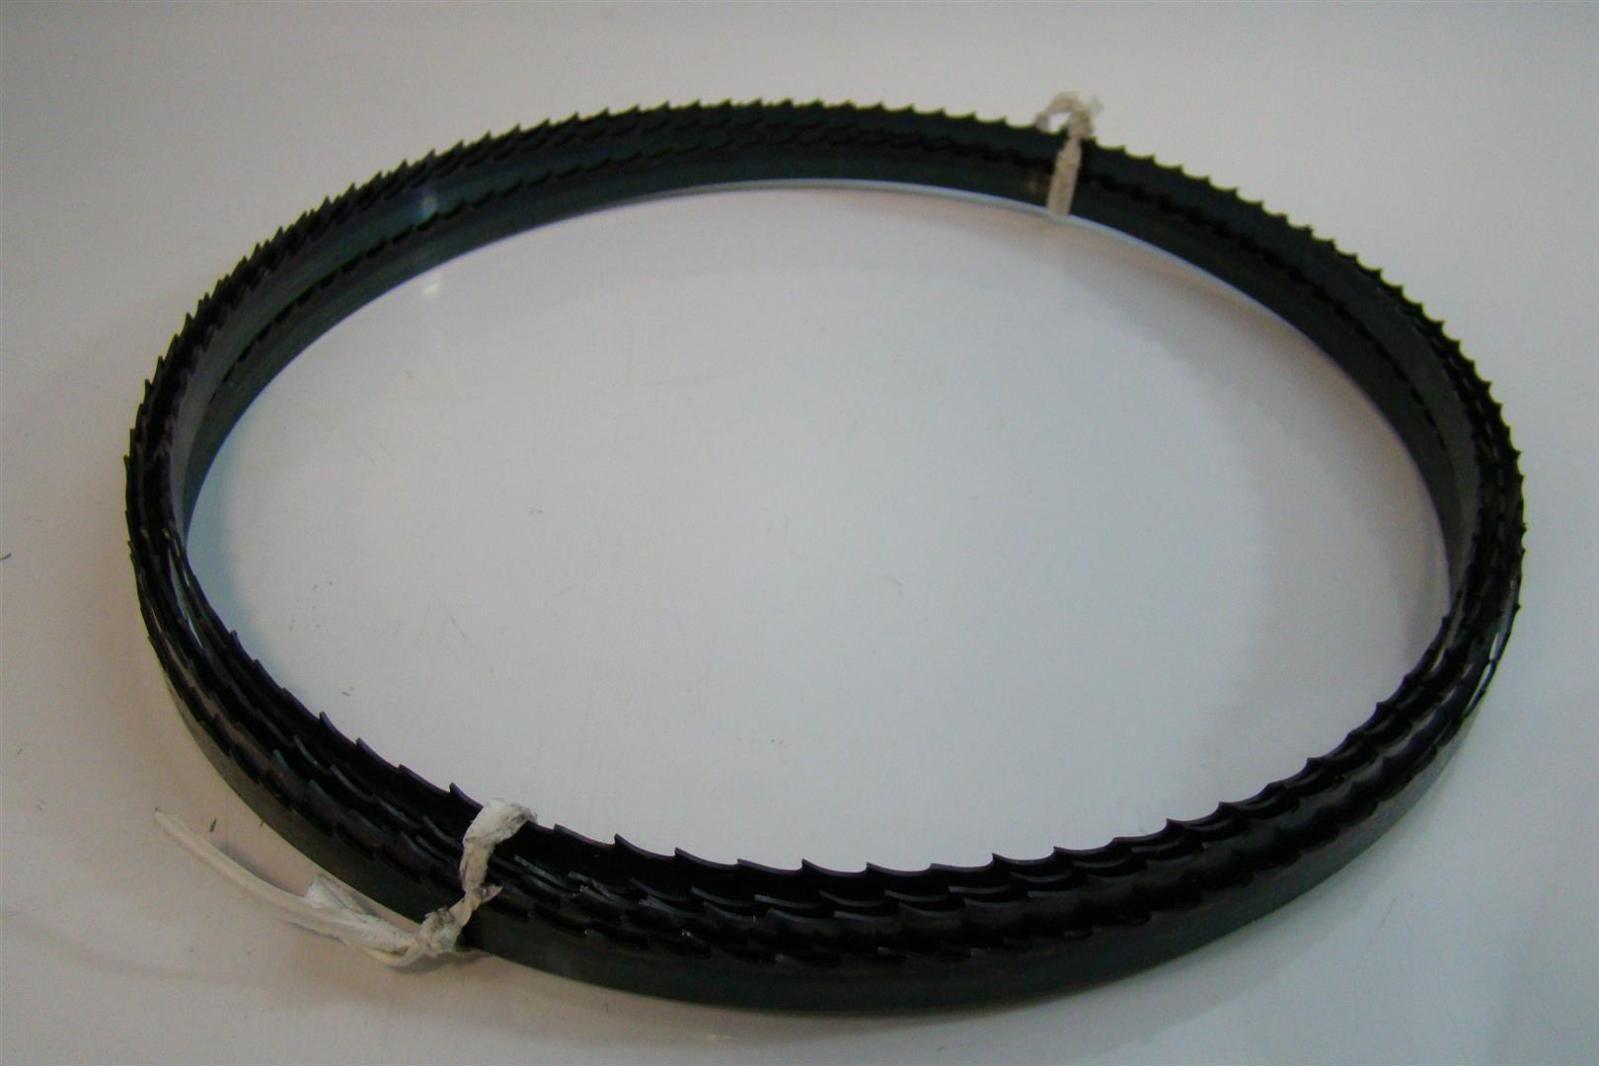 New Lenox Motors >> Lenox EDP #32 Wood Bandsaw Blade 89175 19 B X 1/2 032 3 ...